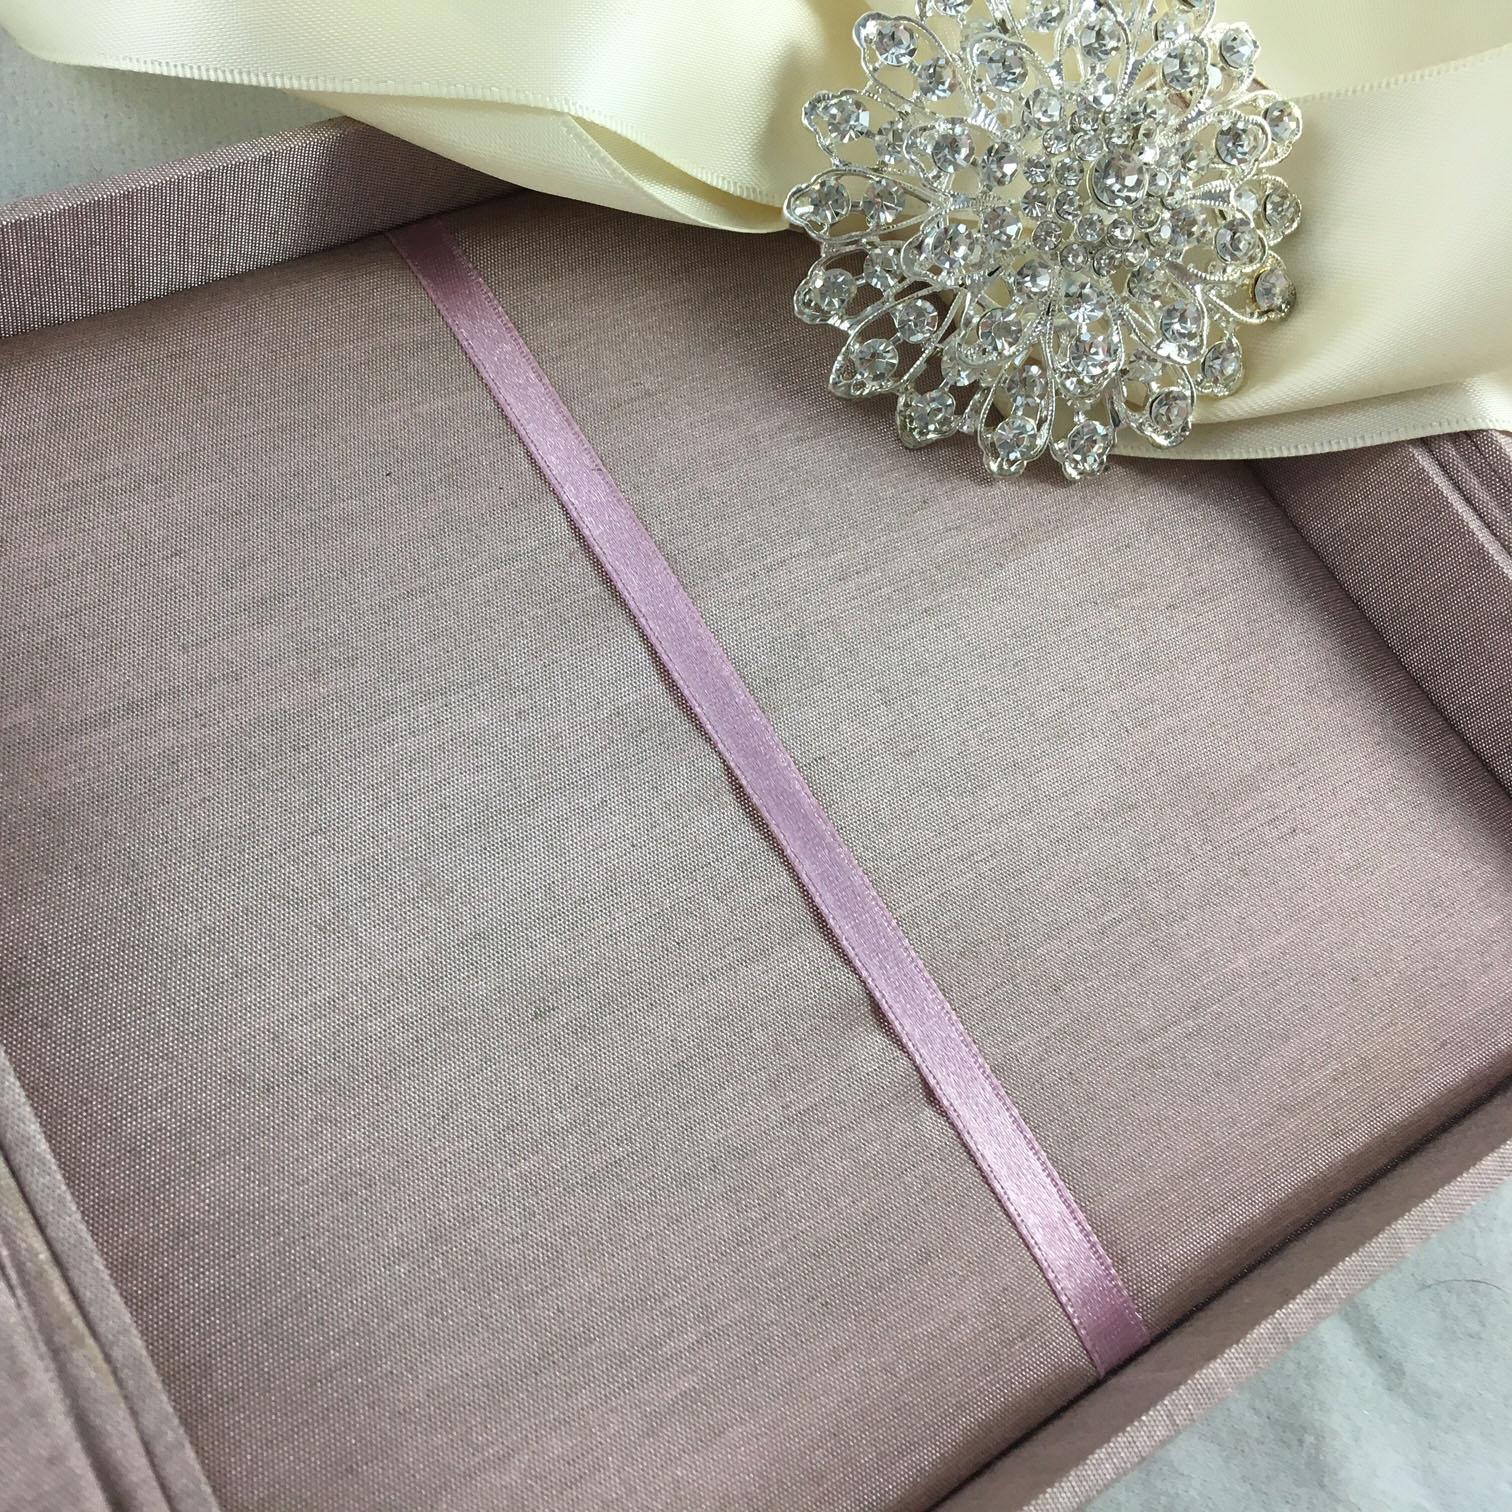 silk box with brooch